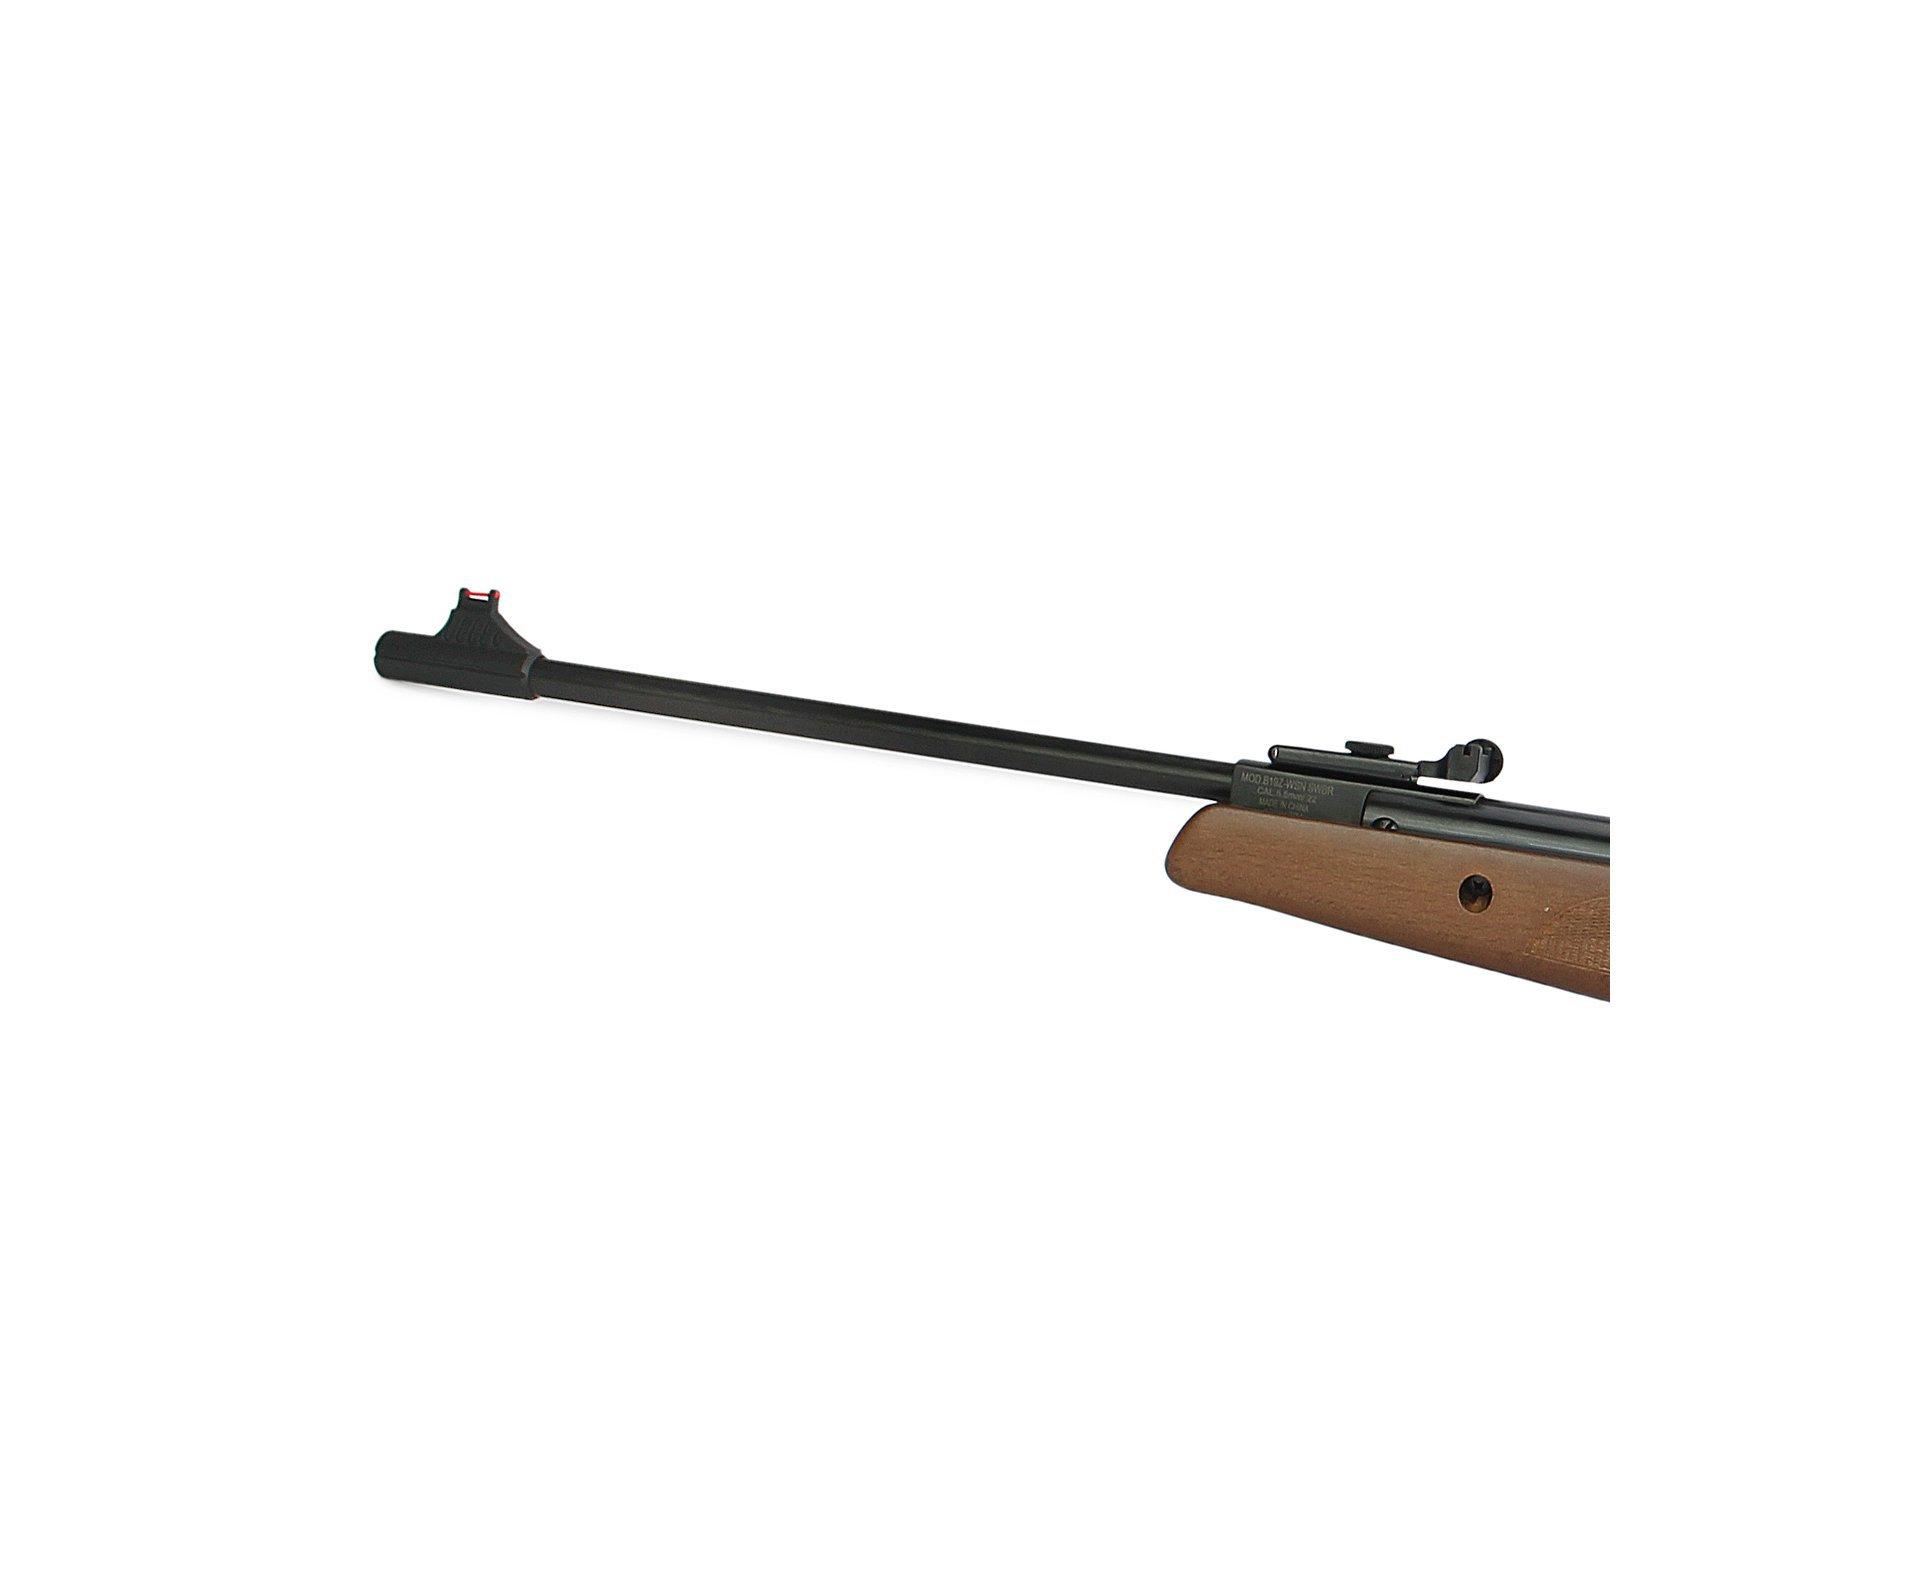 Carabina De Pressão Bam B19-z Hunter Wood 5.5mm - Swbr